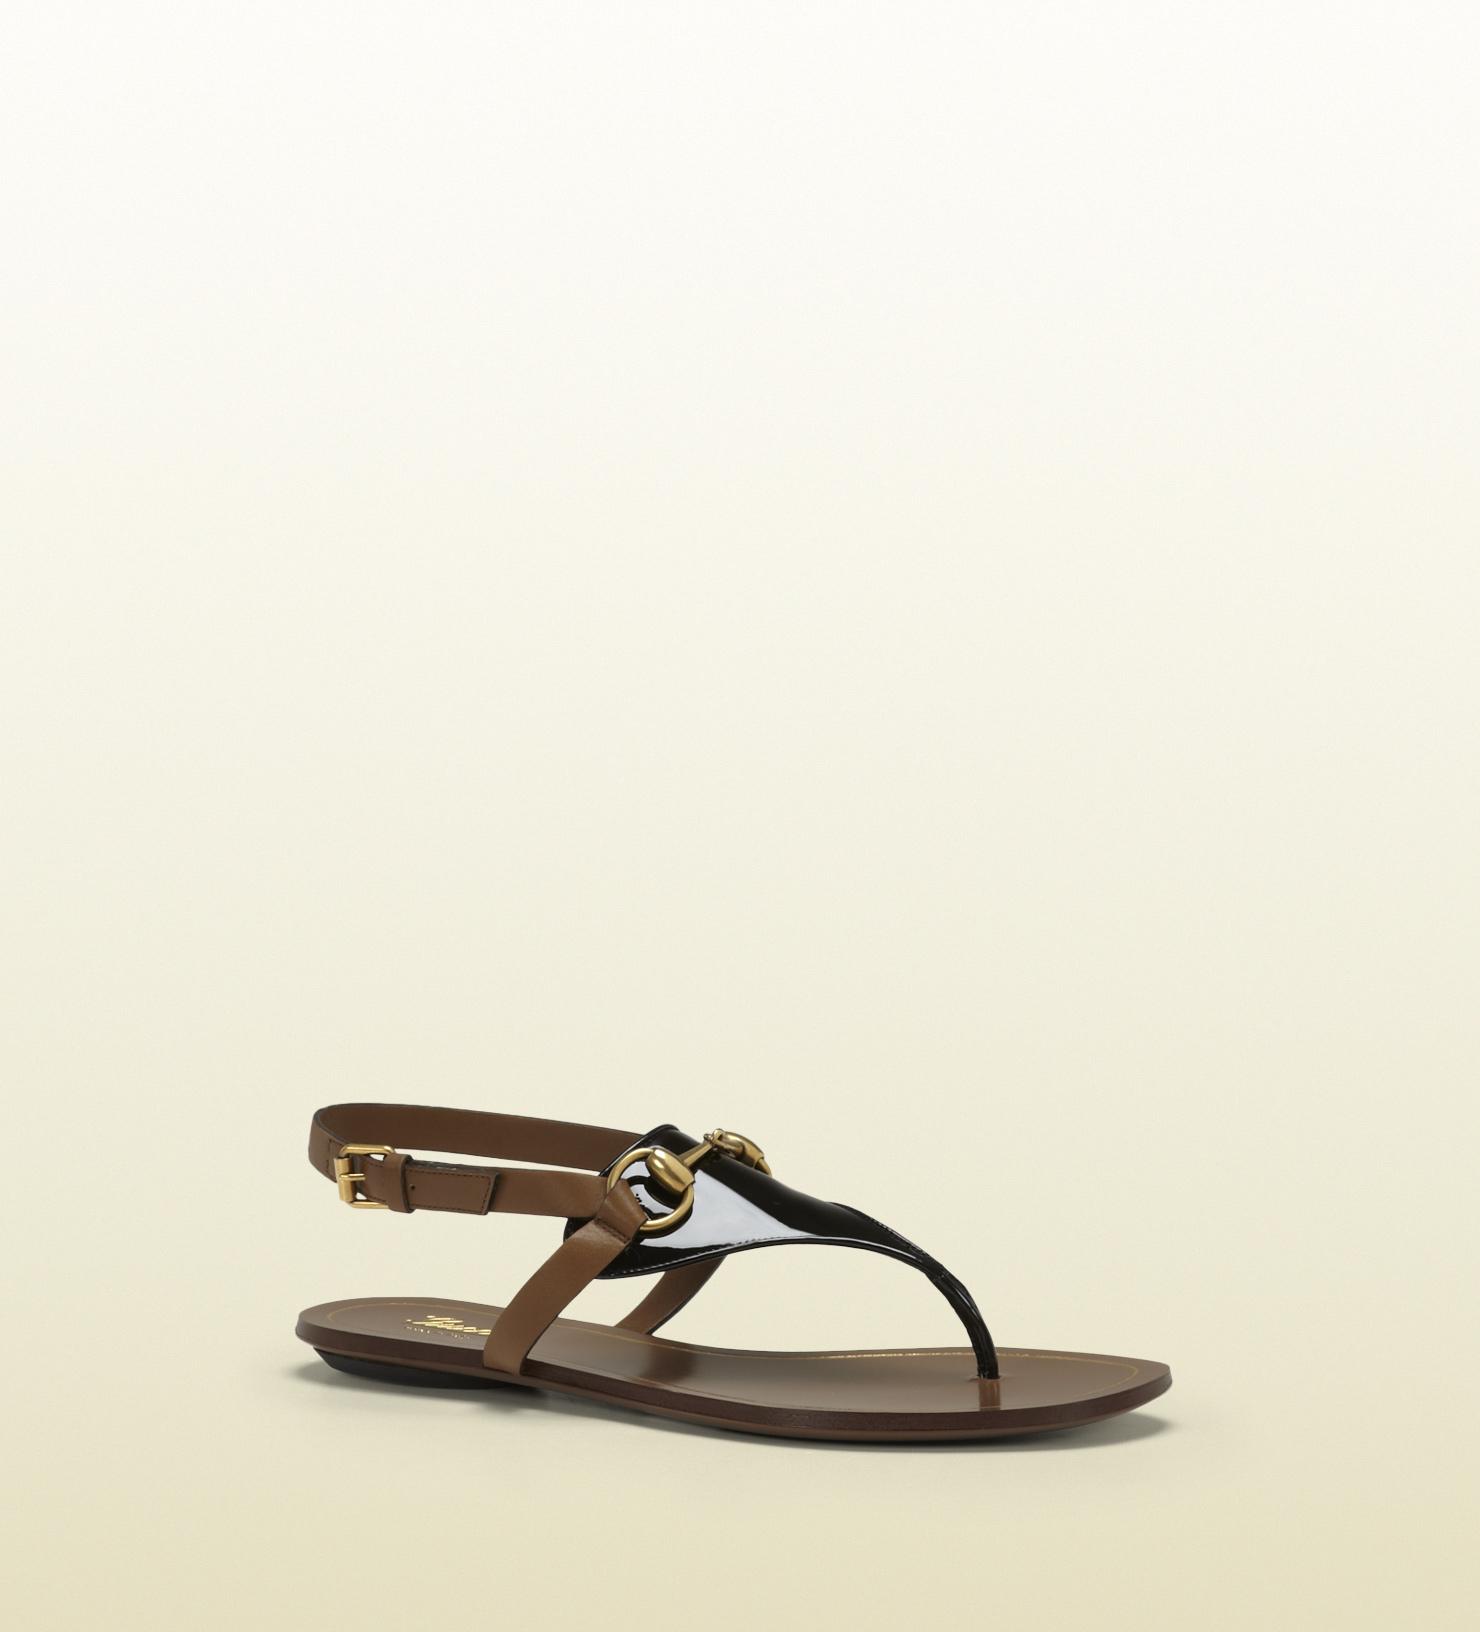 7af478a86946 Lyst - Gucci Alyssa Black Patent Leather Thong Sandal in Black for Men